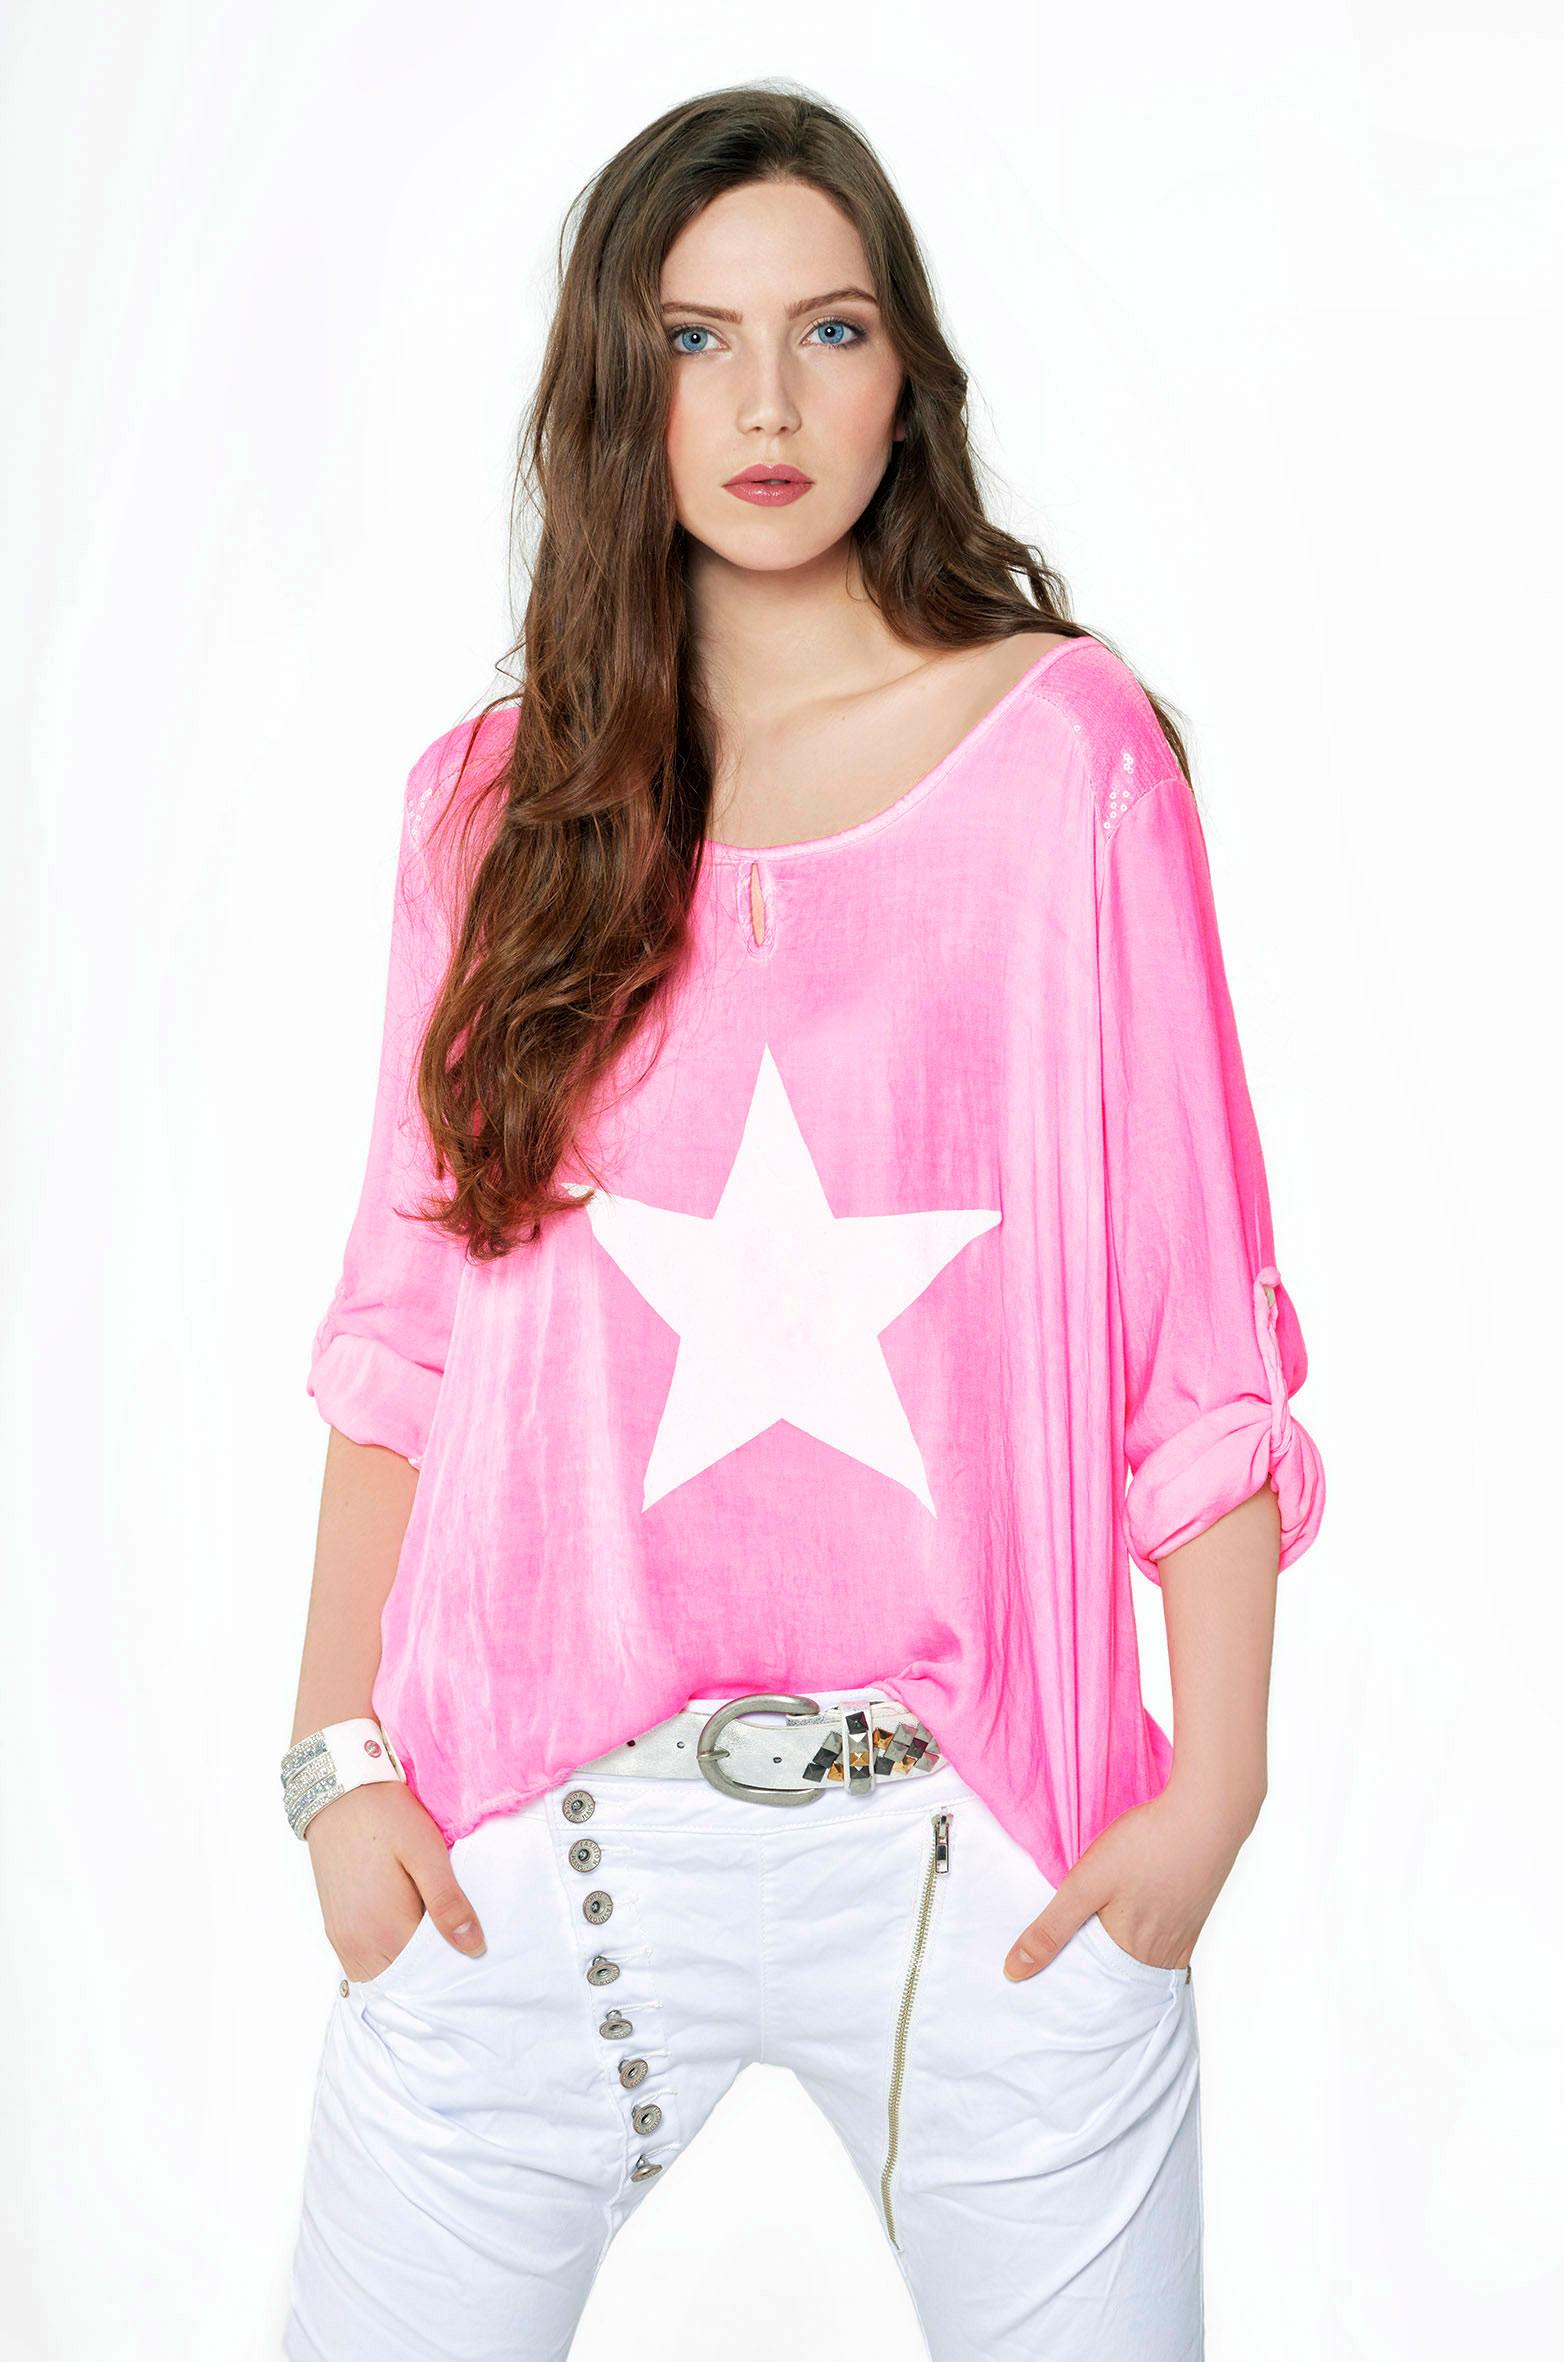 madonna people fashion shoot pinkfarbenes t shirt mit